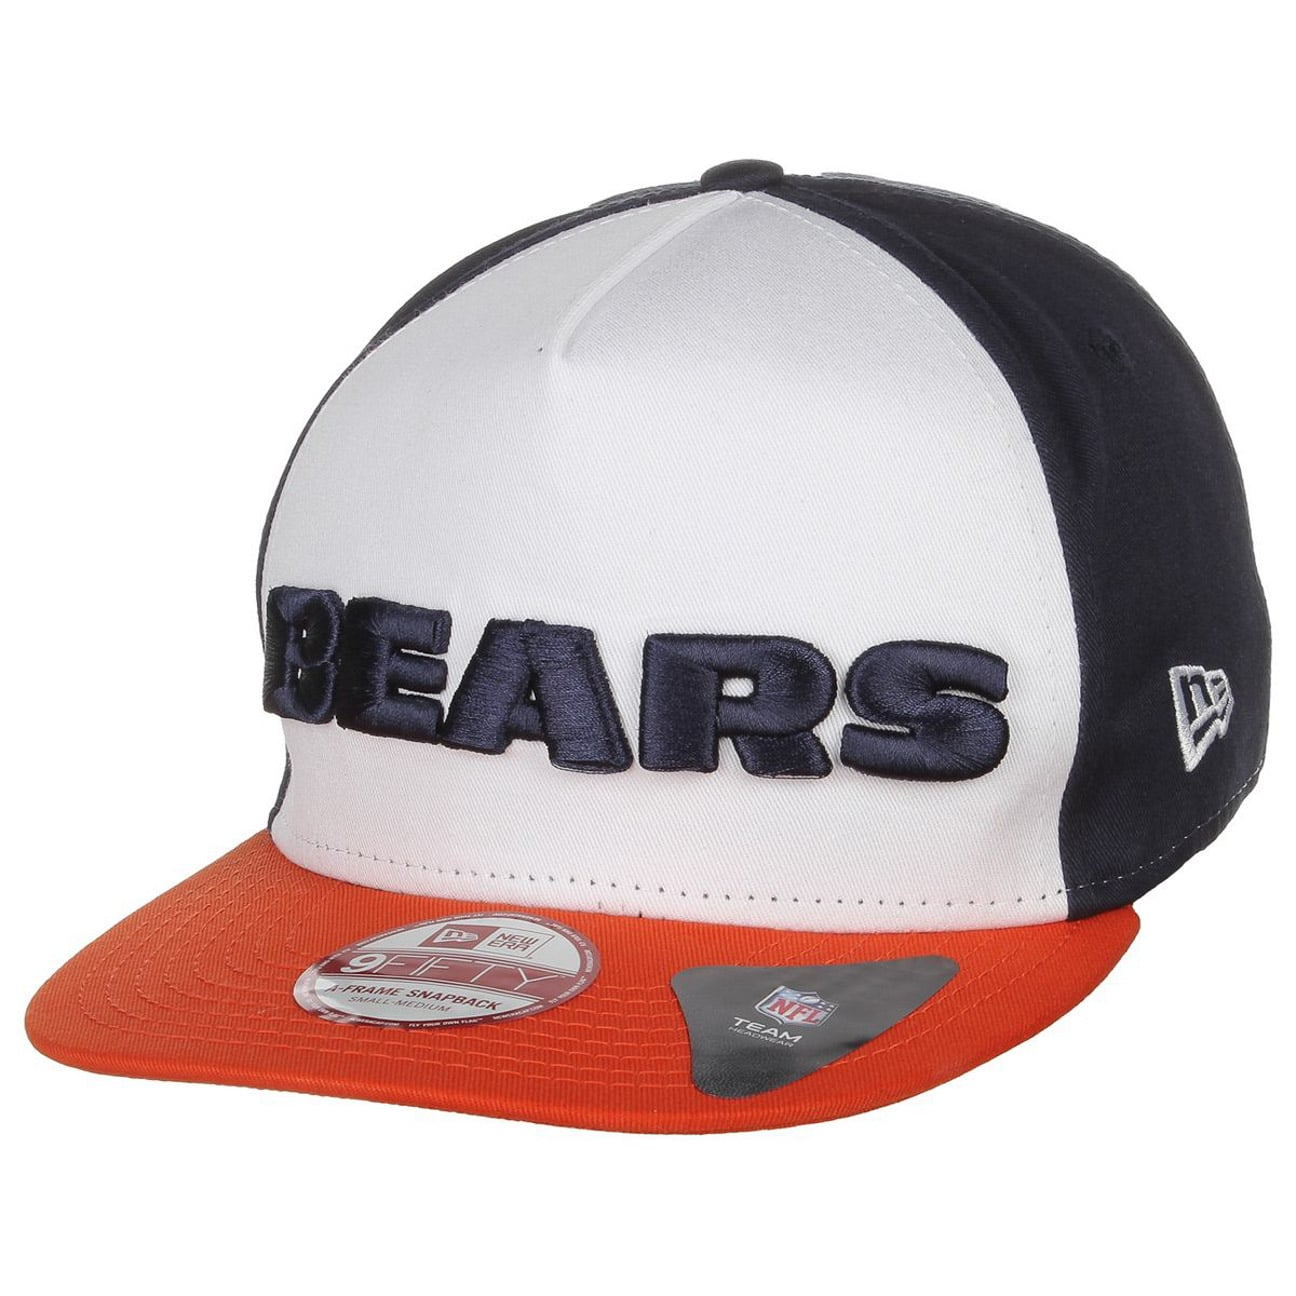 7d301d5eb7377 Gorra 9Fifty Chicago Bears by New Era - Gorras - sombreroshop.es